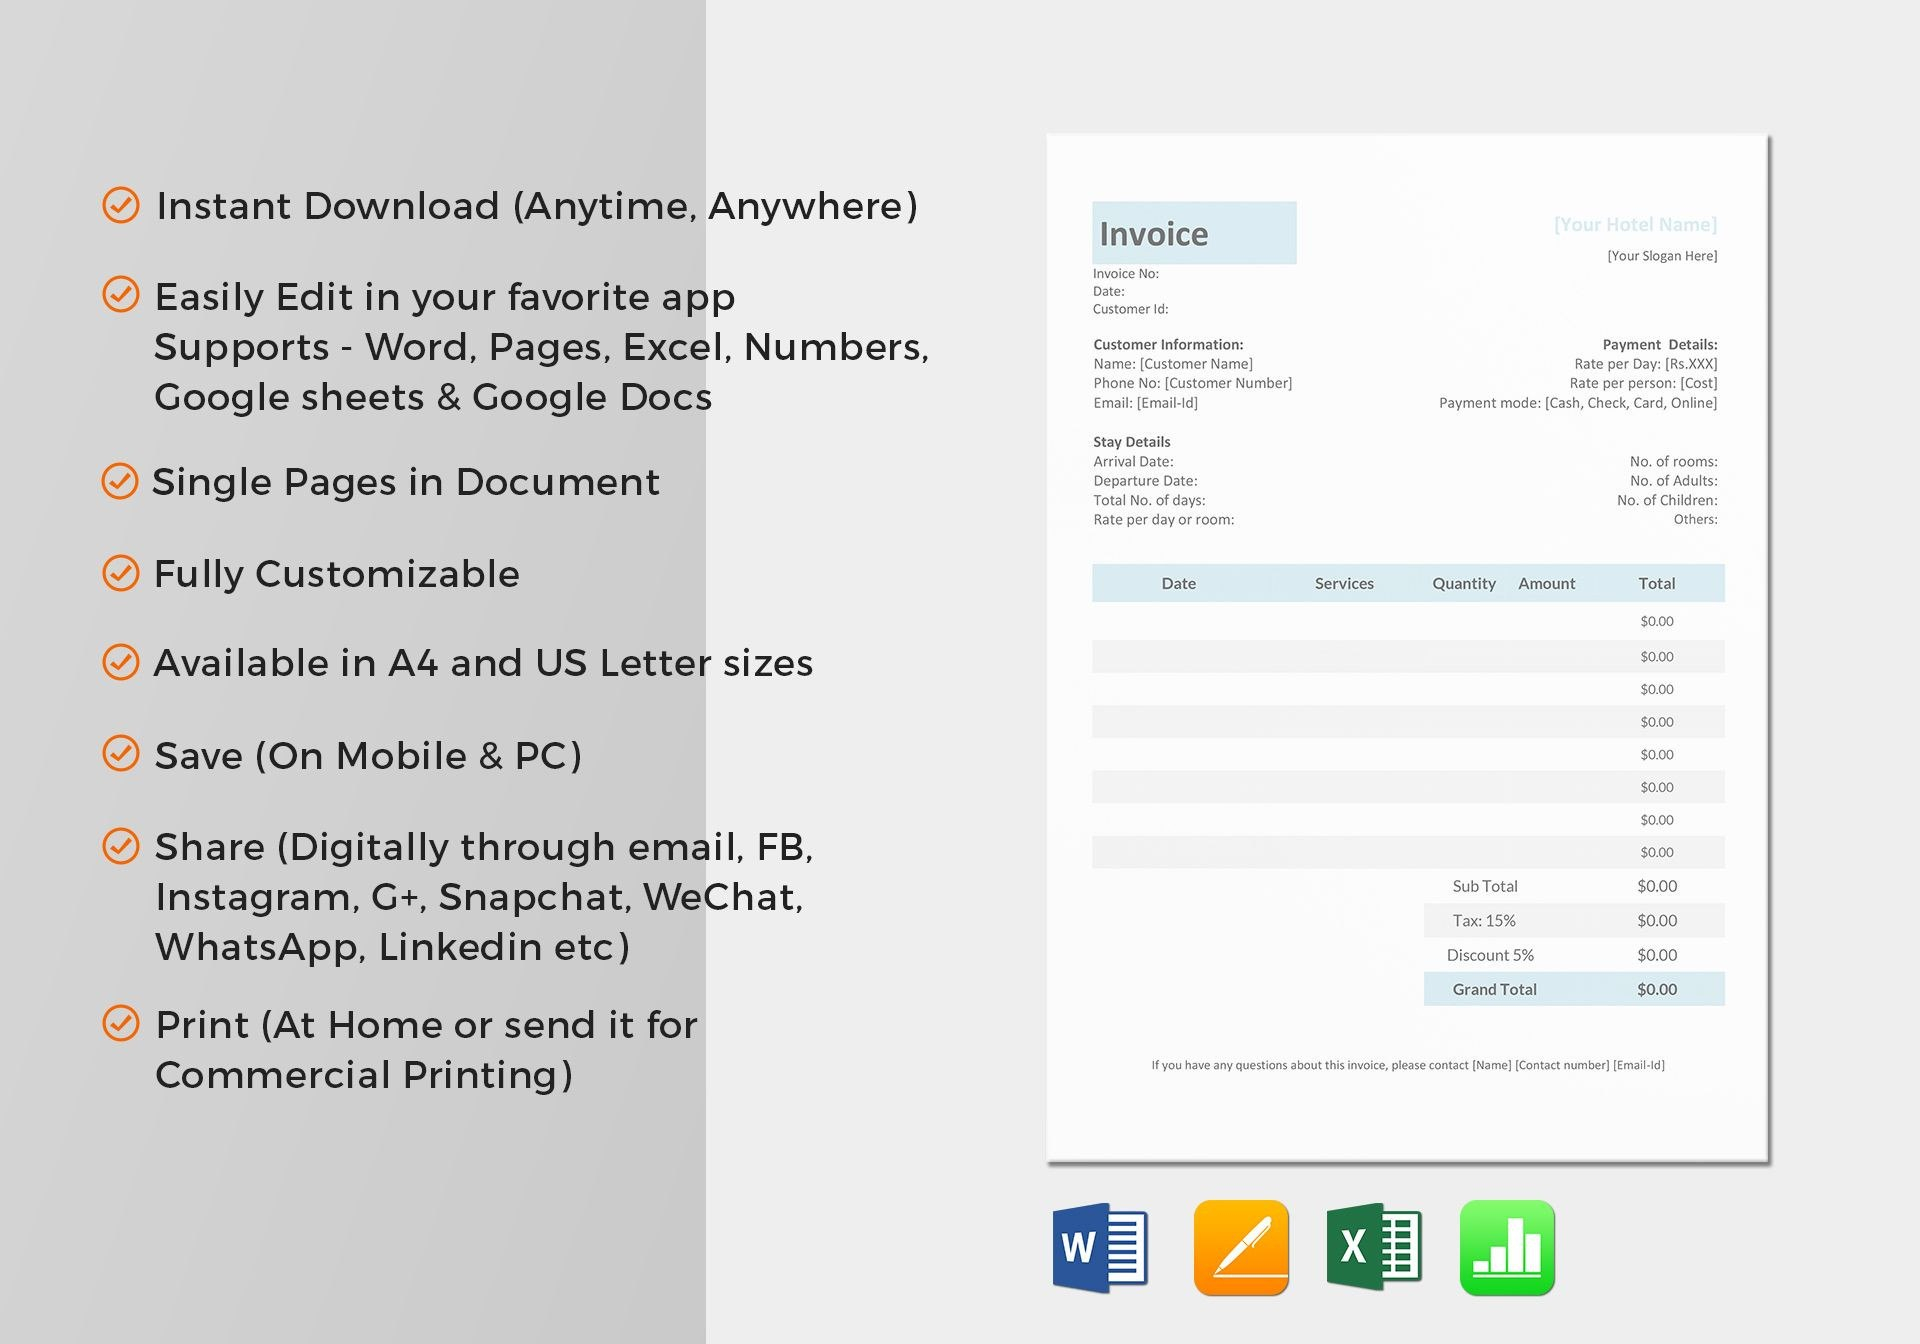 Excel Auf Ipad Von Hotel Invoice Template In Word Excel Apple Pages With Ipad Invoice Template